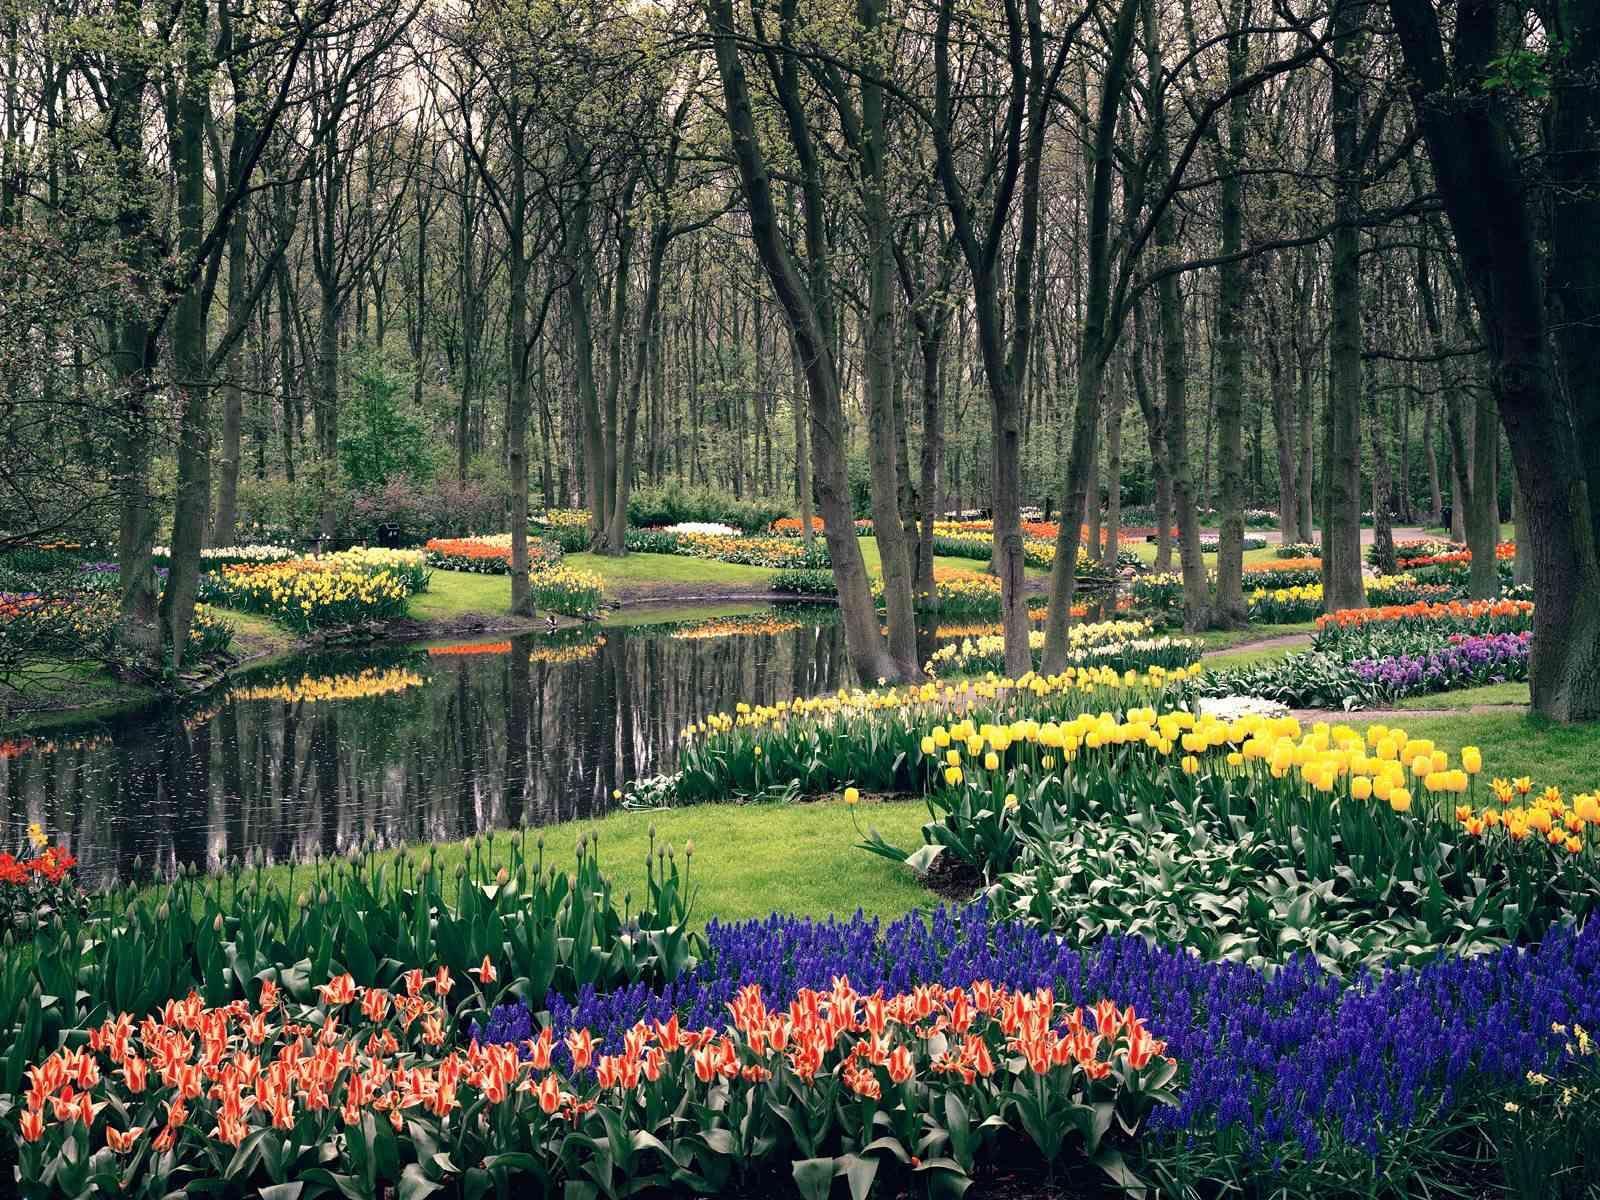 keukenhof gardens netherlands | I want to visit this place someday ...